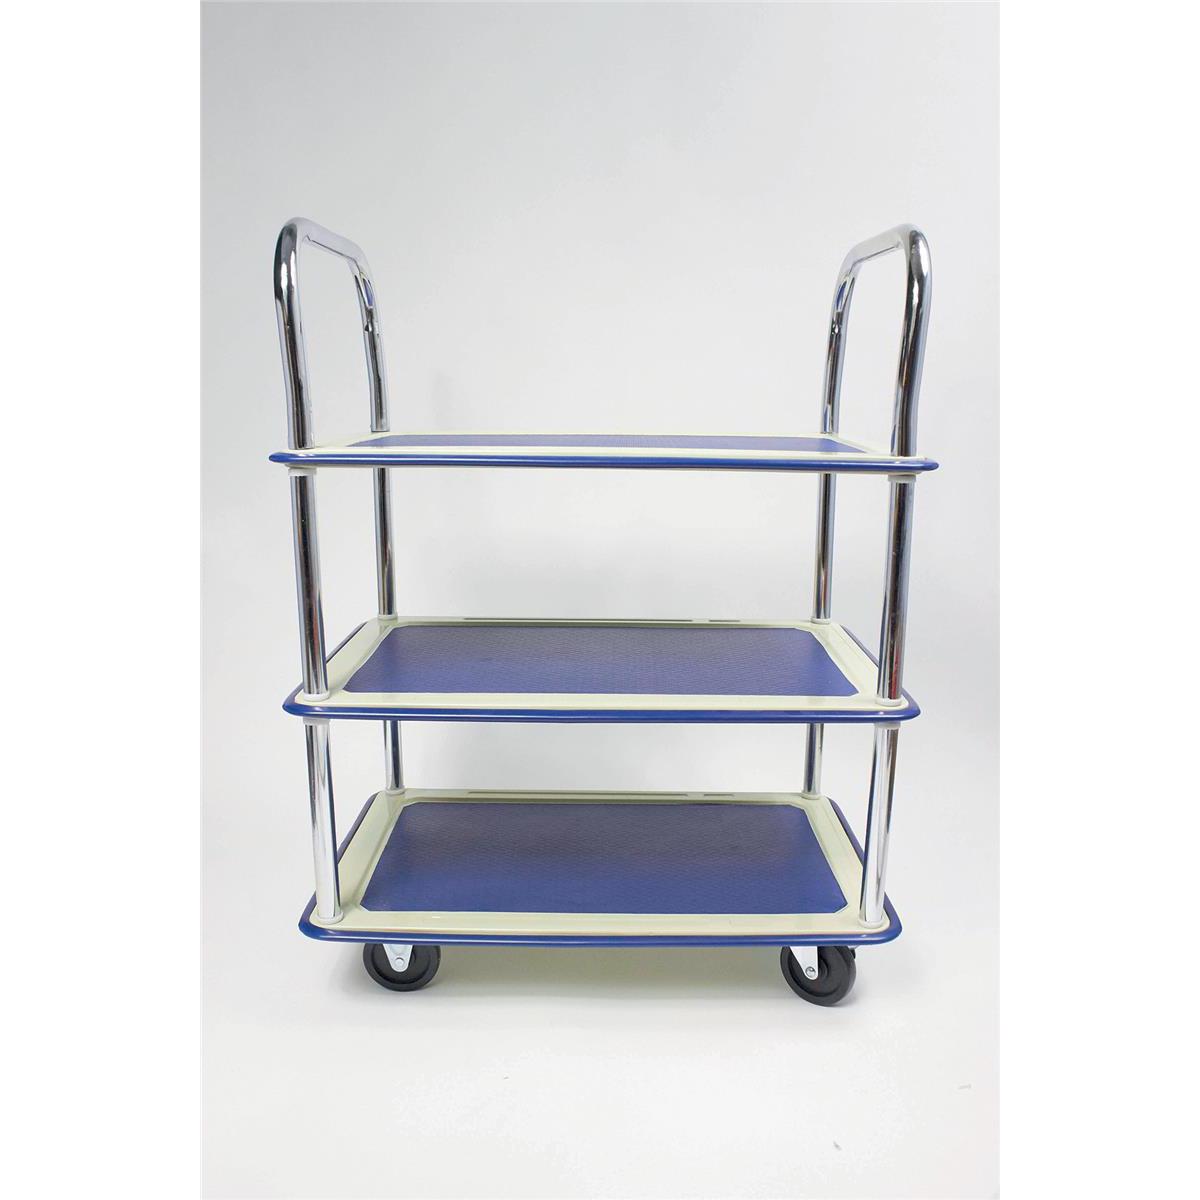 5 Star Facilities Trolley Lightweight Steel Frame 3 Shelf Capacity 120kg Chrome W470xD725xH950mm